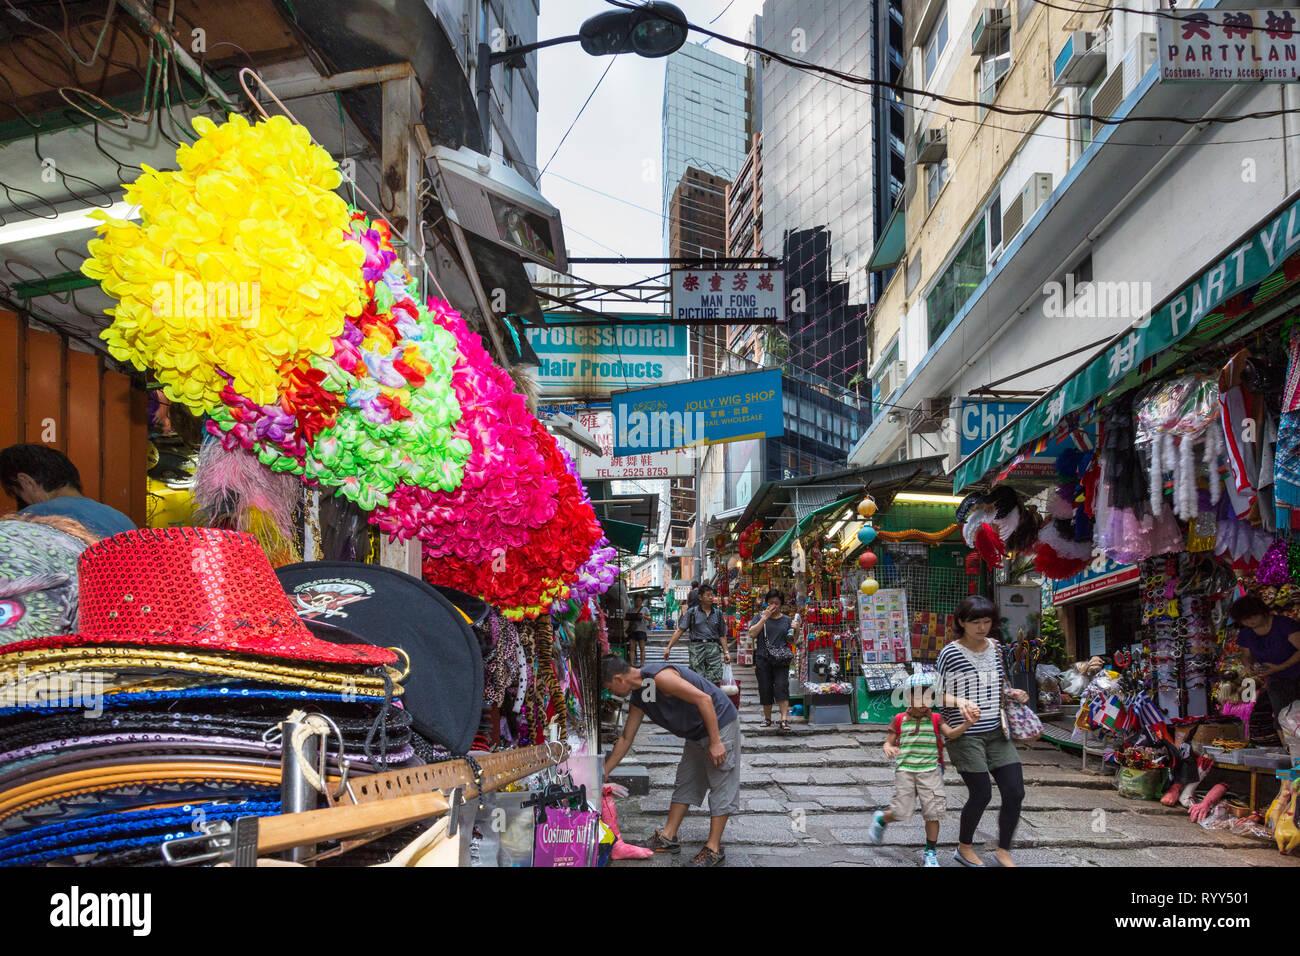 aec00426593 Market stall on Pottinger Street, Central, Hong Kong, SAR, China ...